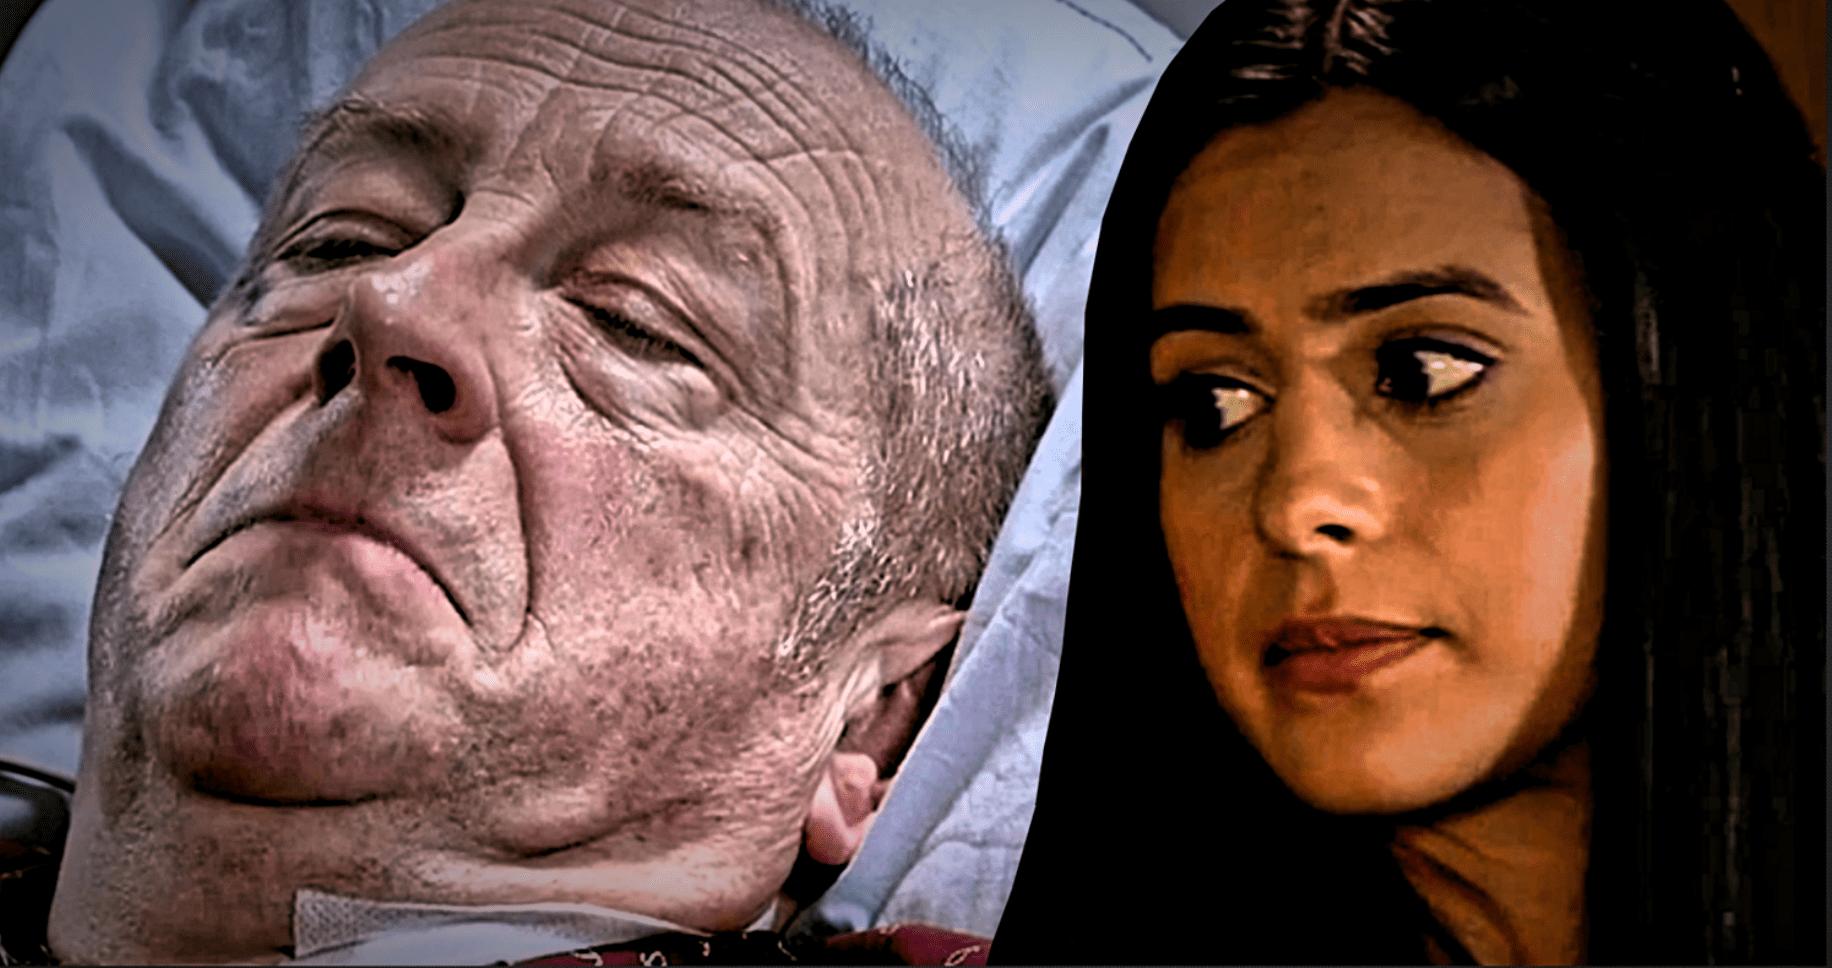 Coronation Street spoilers: Alya Nazir takes drastic action to get rid of Geoff Metcalfe